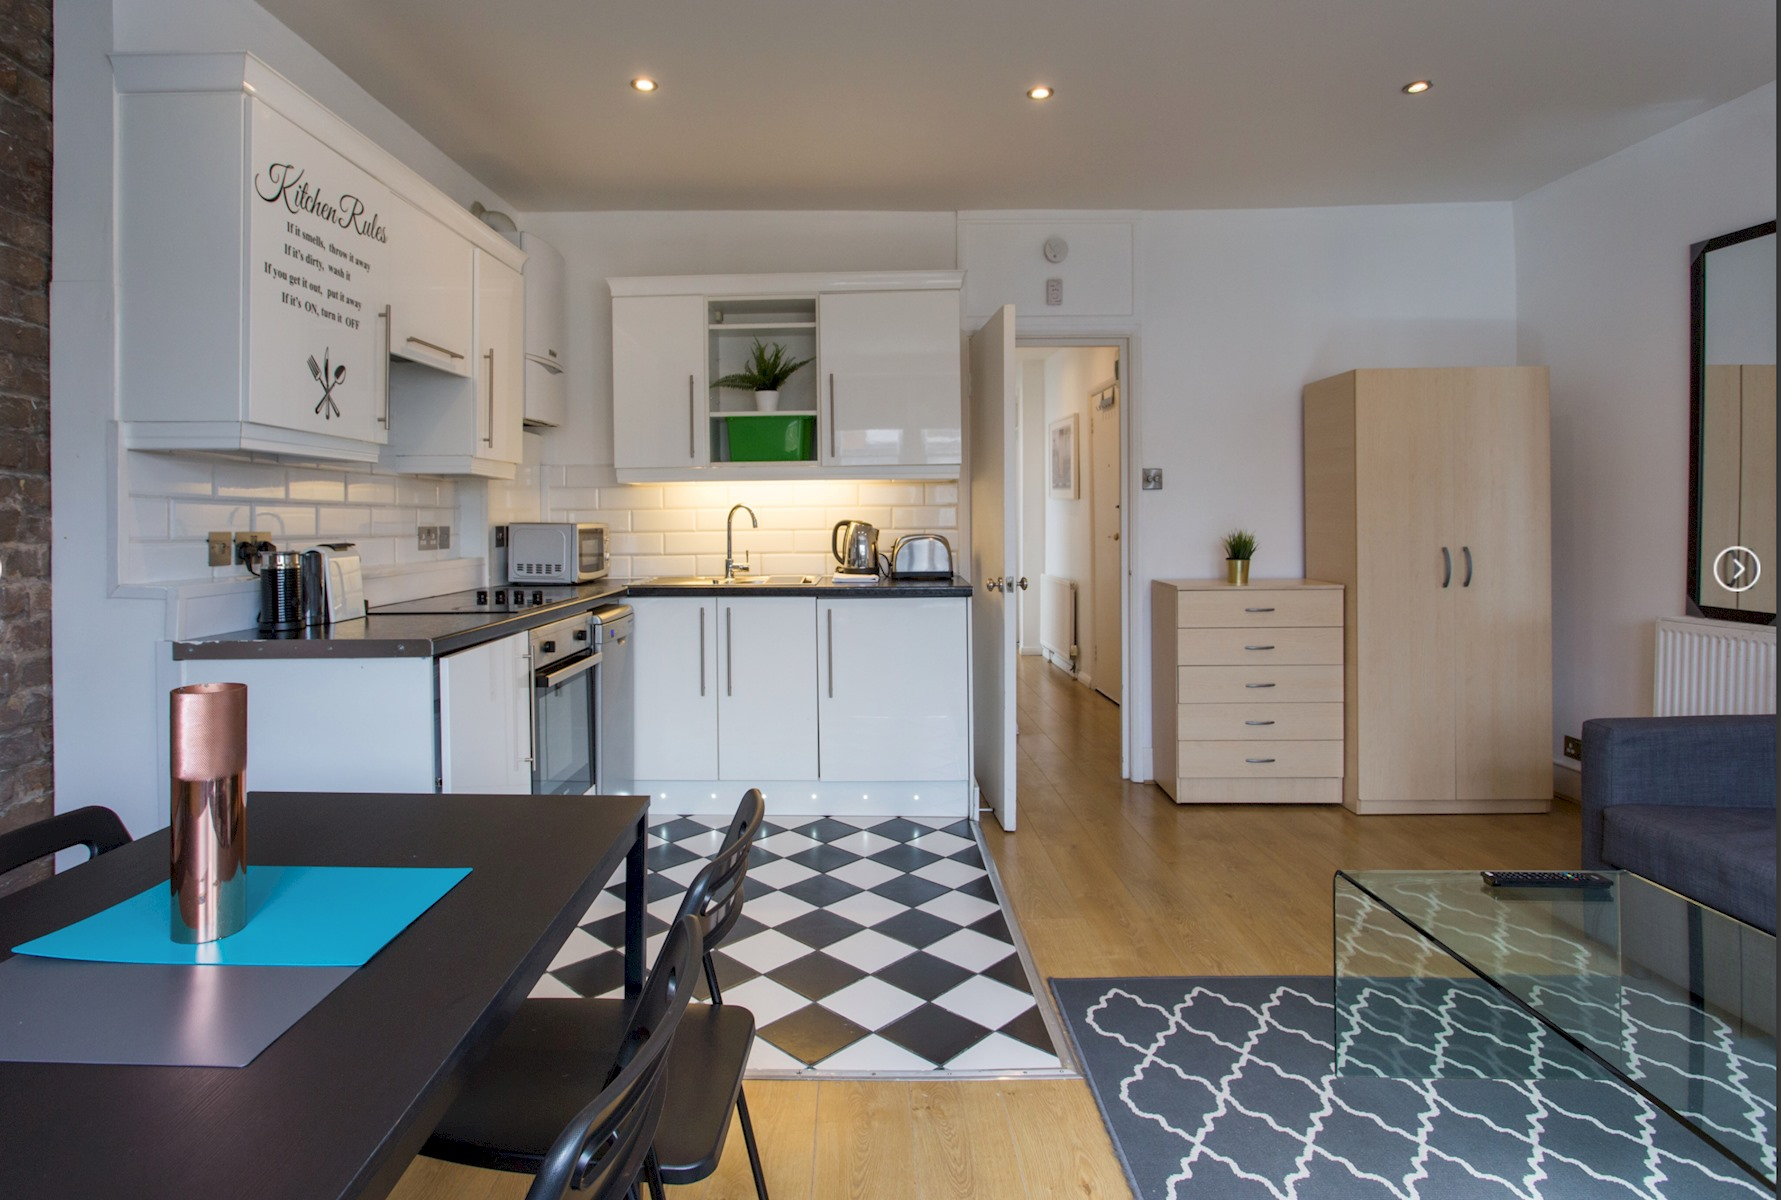 2 Bedroom Apartment near Edgware Road F6 BS (RU/CL) photo 16089031